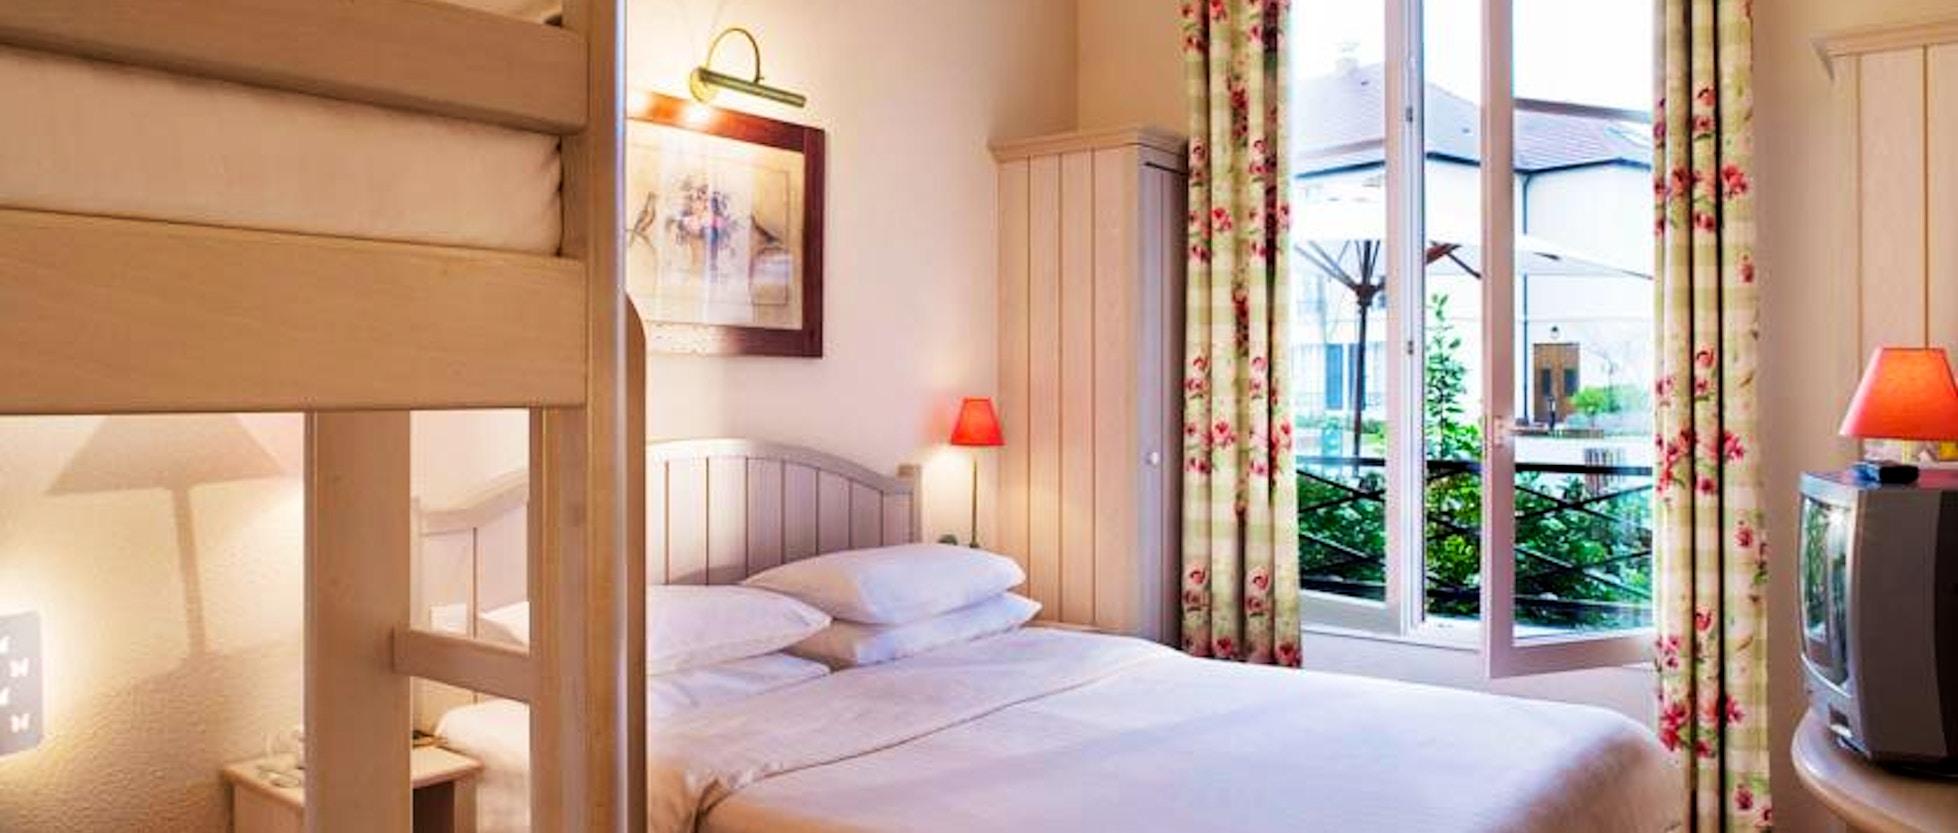 Disneyland paris hotel dove dormire vicino ai parchi disney for Soggiornare a parigi